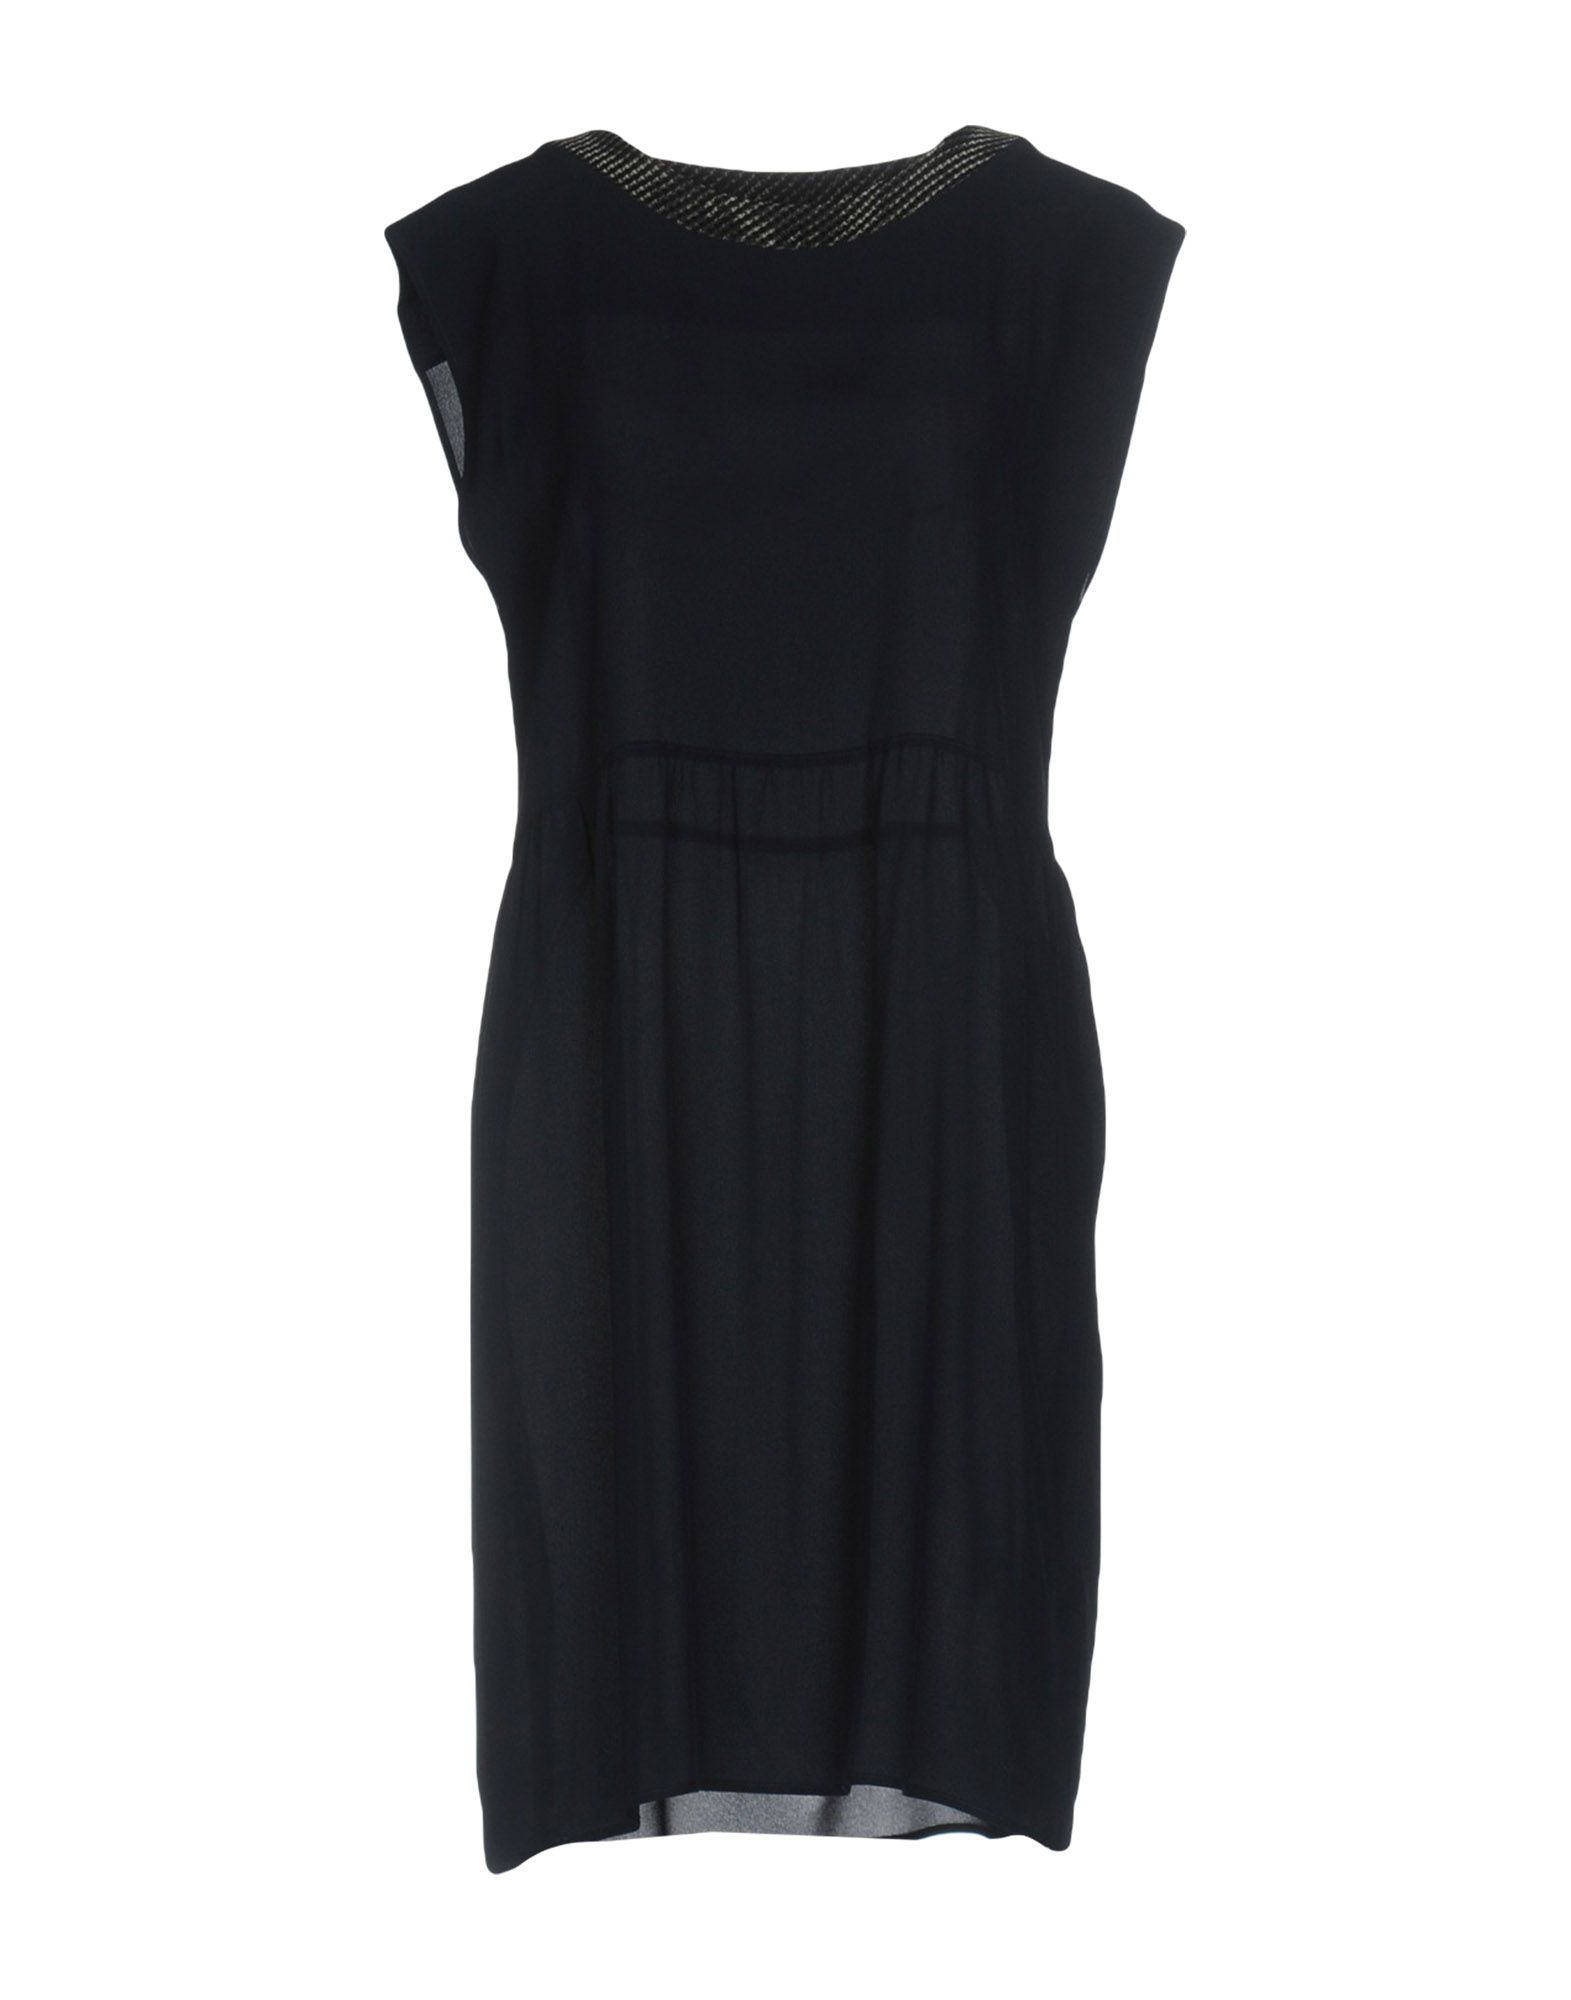 PAUL SMITH BLACK LABEL Короткое платье цена 2017